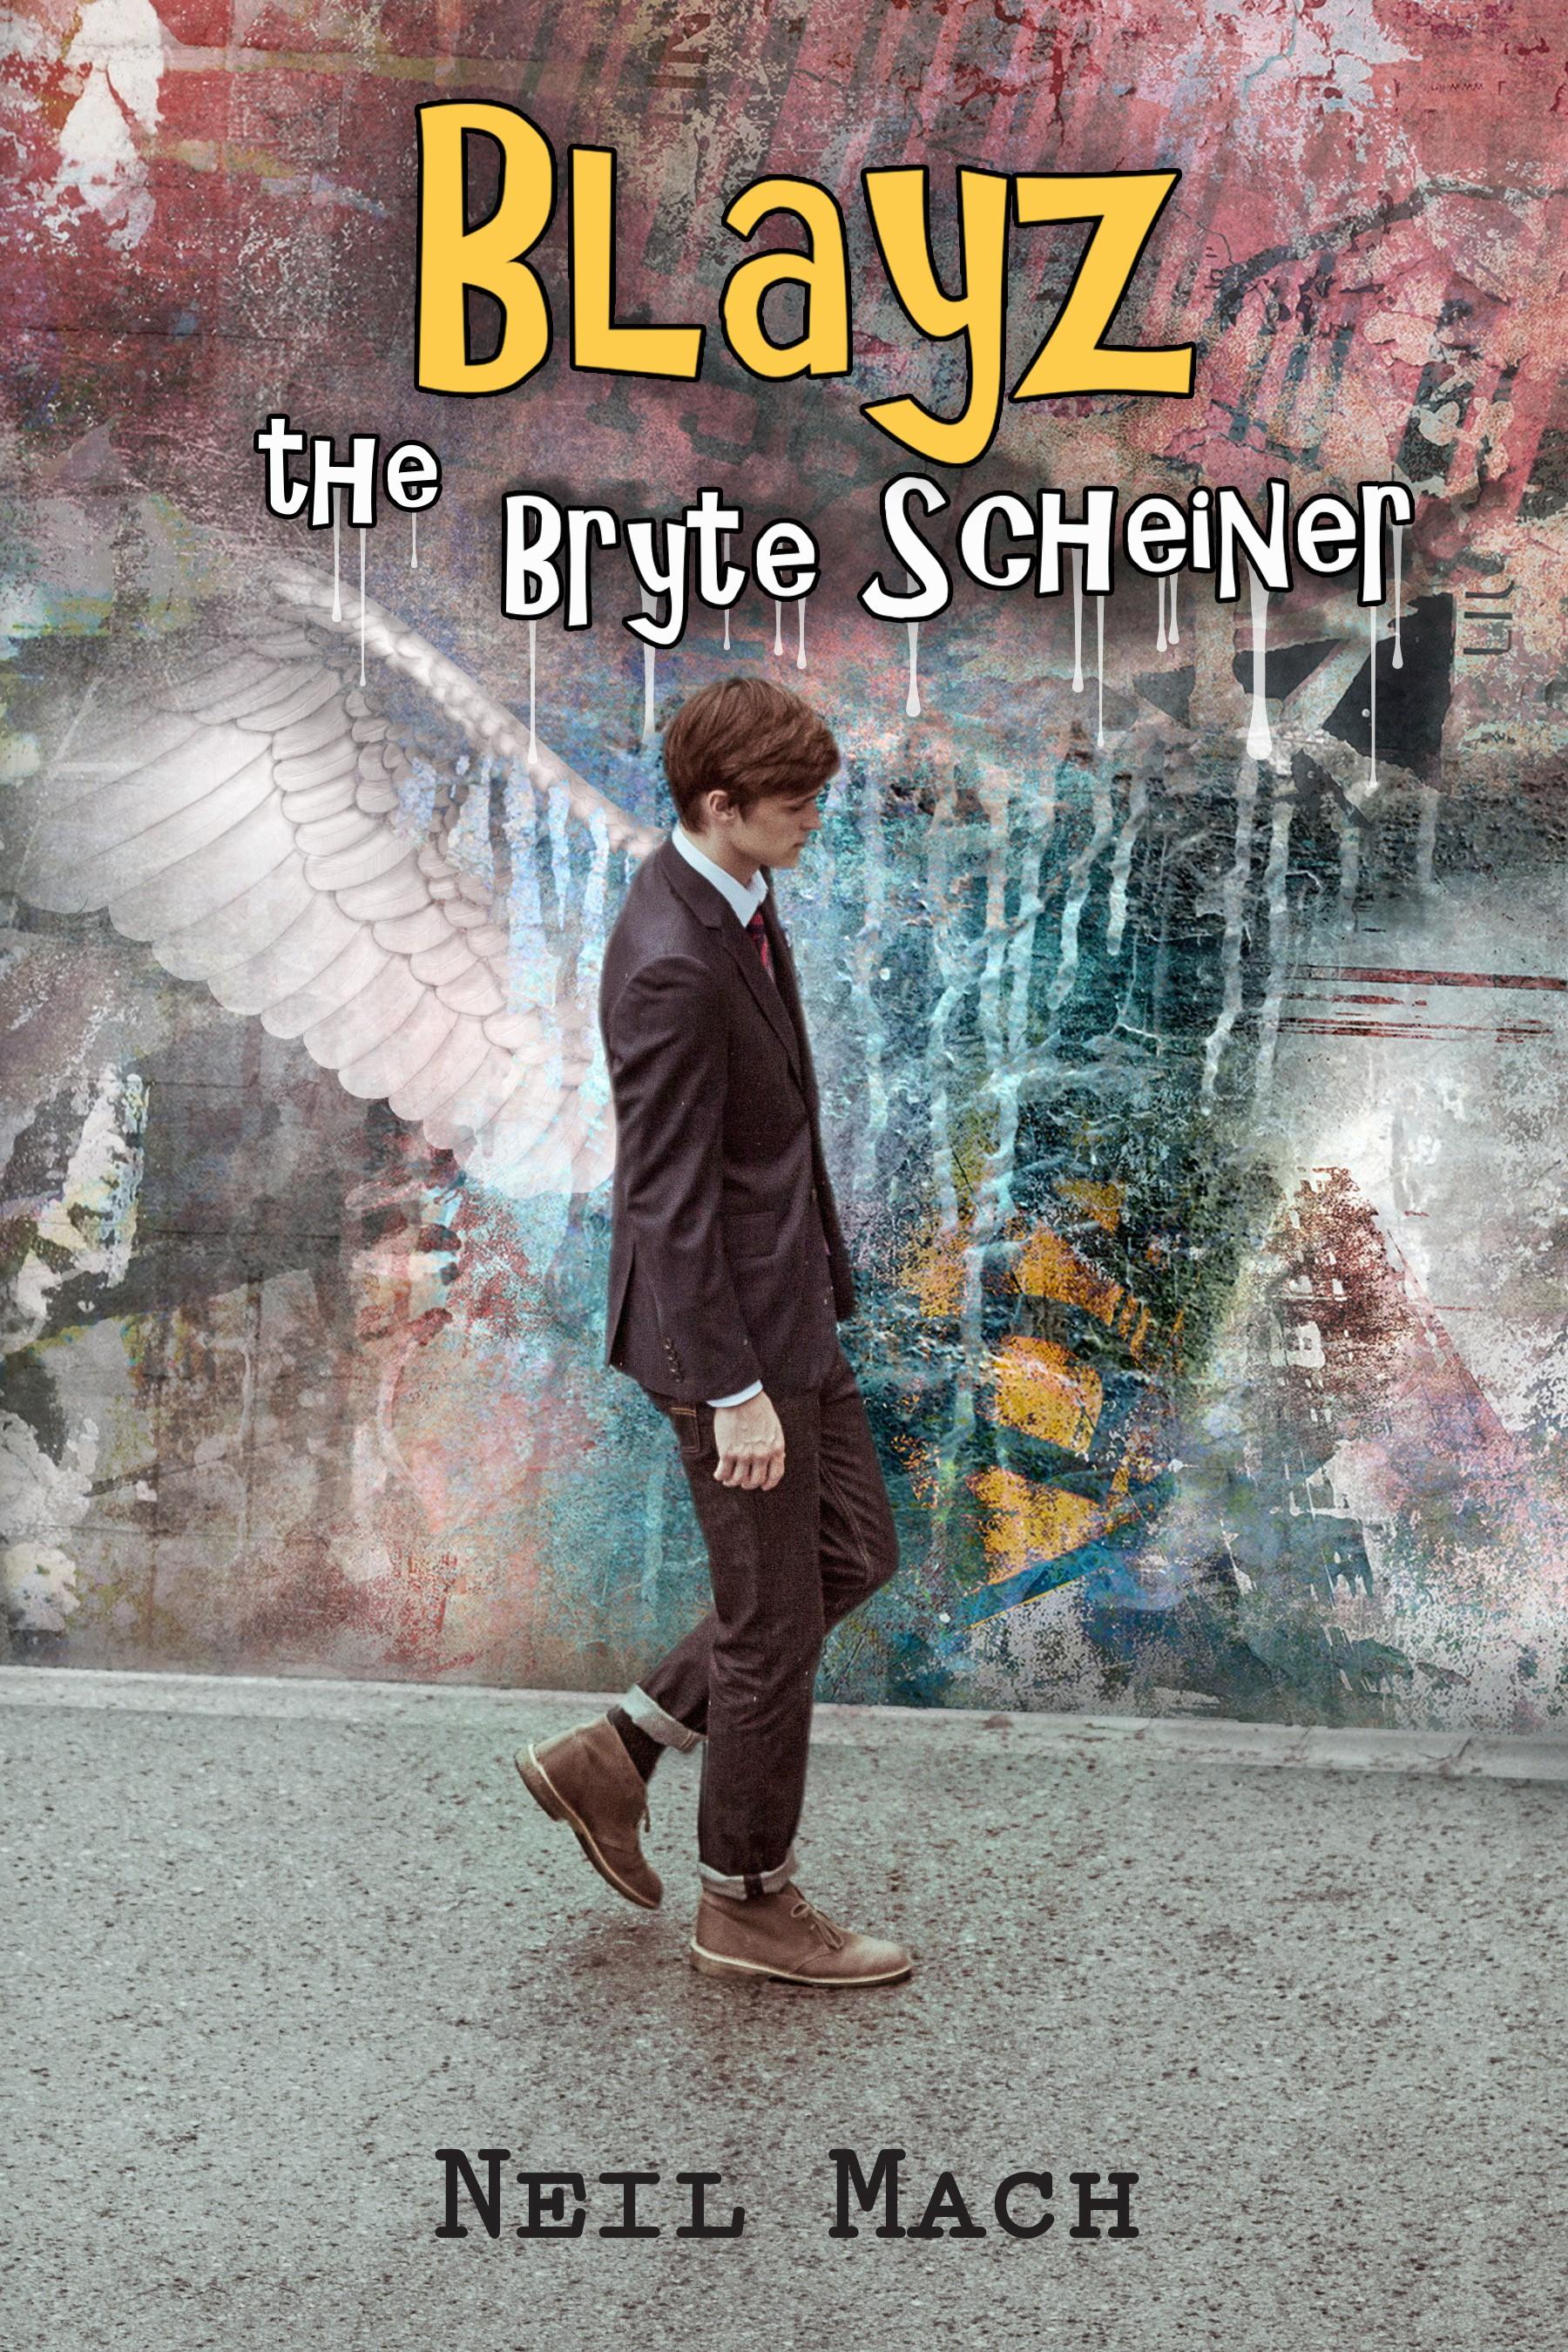 Create a Book Cover for Blayz the Bryte Scheiner